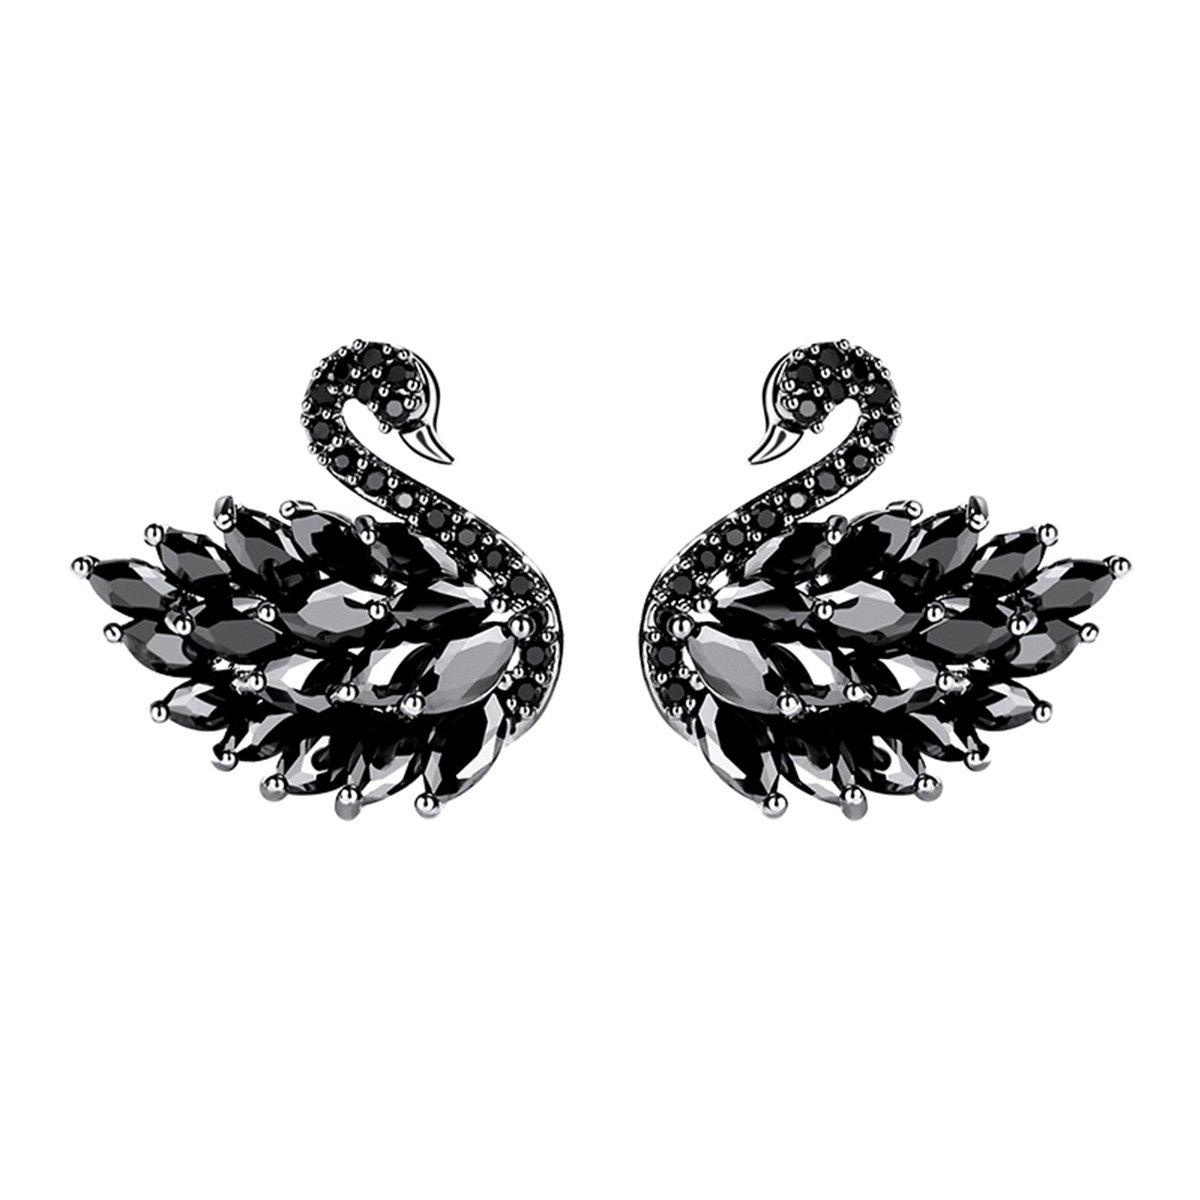 Merdia Lovely Swan Stud Earrings Cubic Zirconia Sterling Silver Pin for Women and Girls-Black Swan